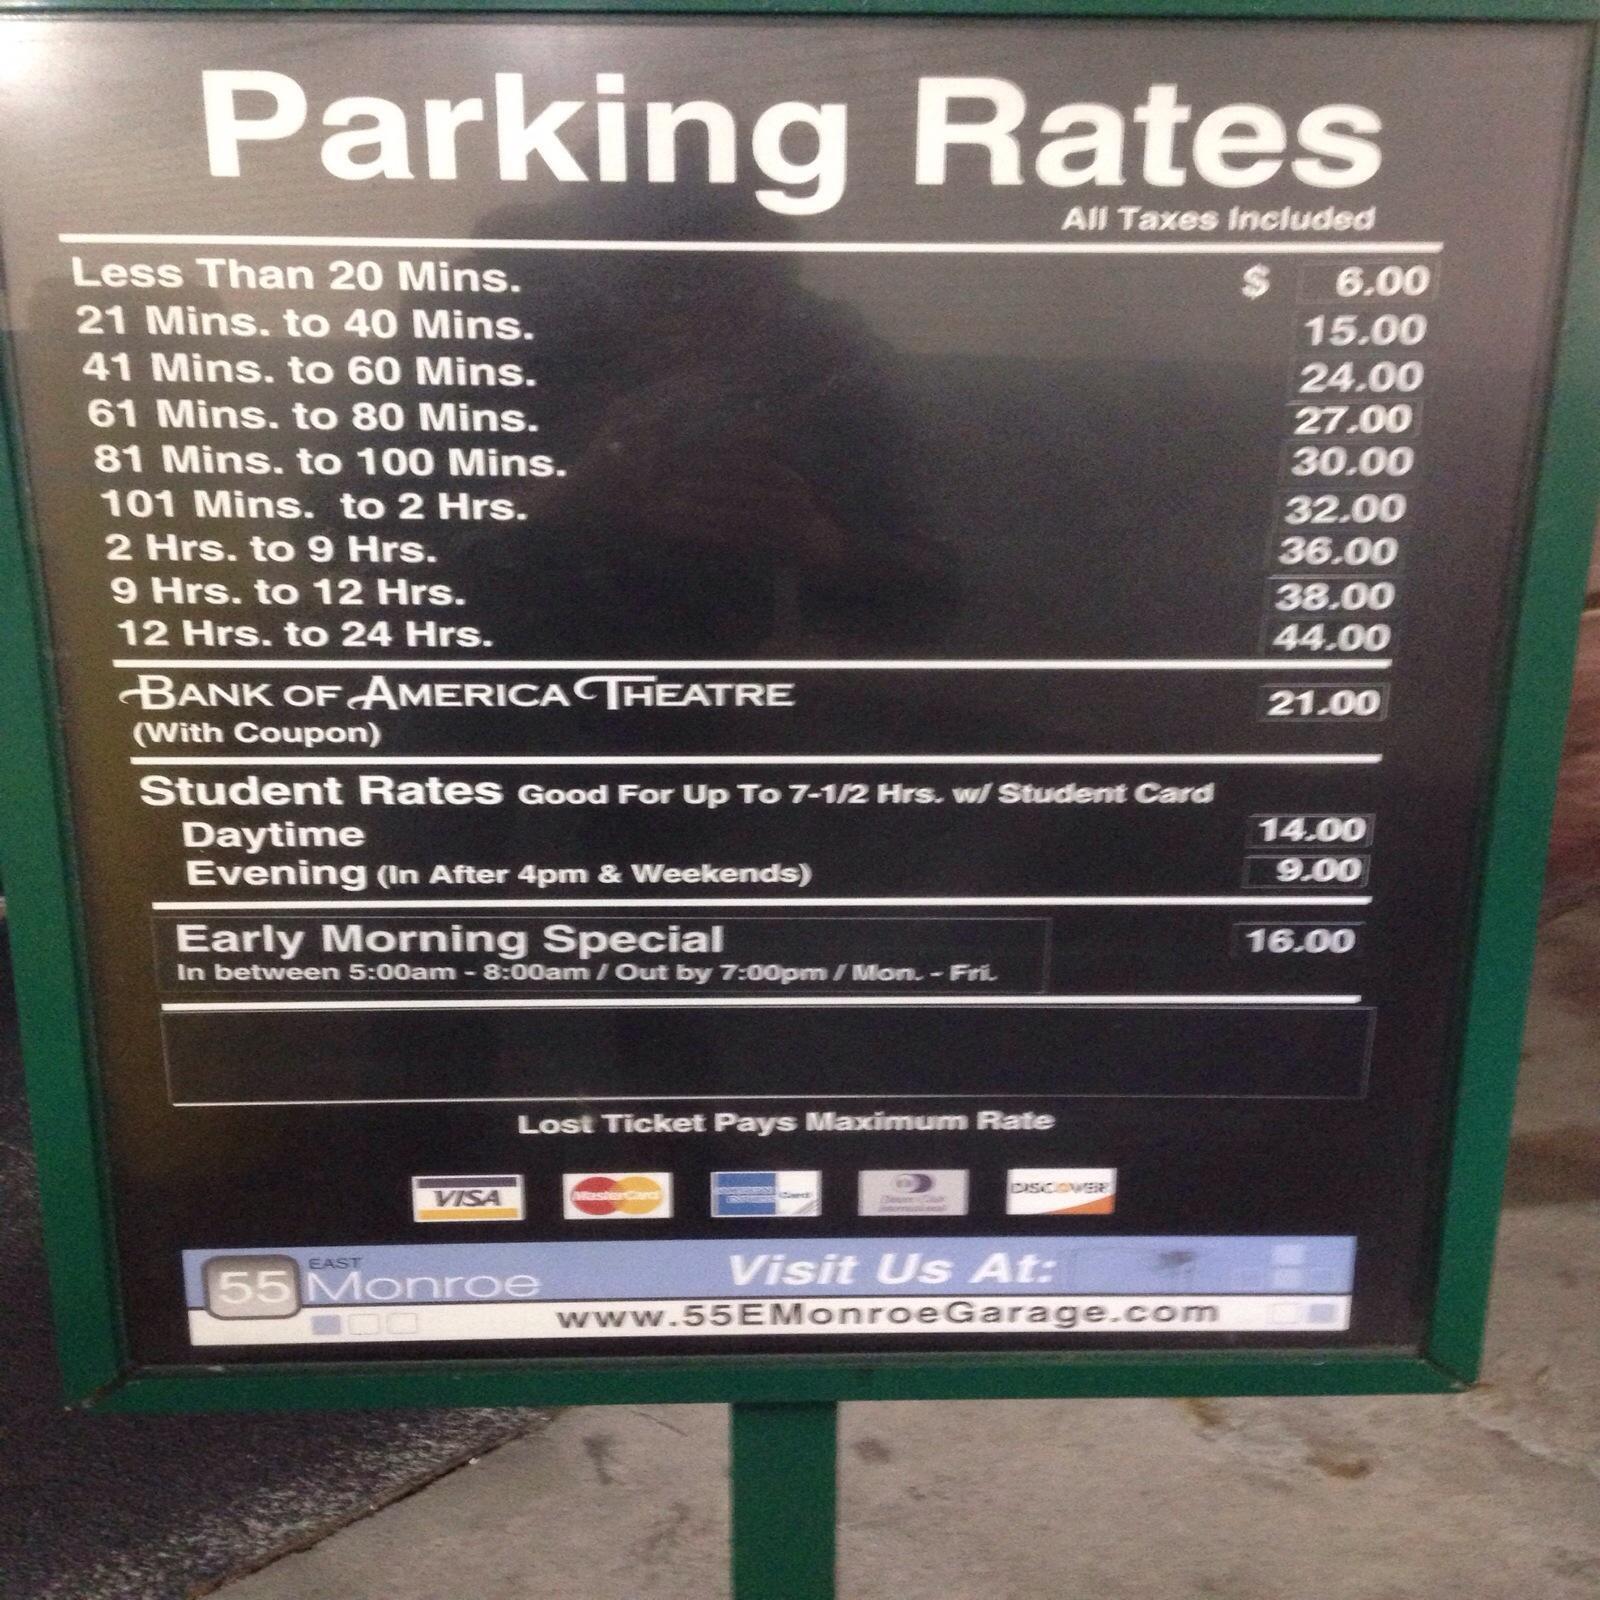 55 East Monroe Garage - Parking In Chicago